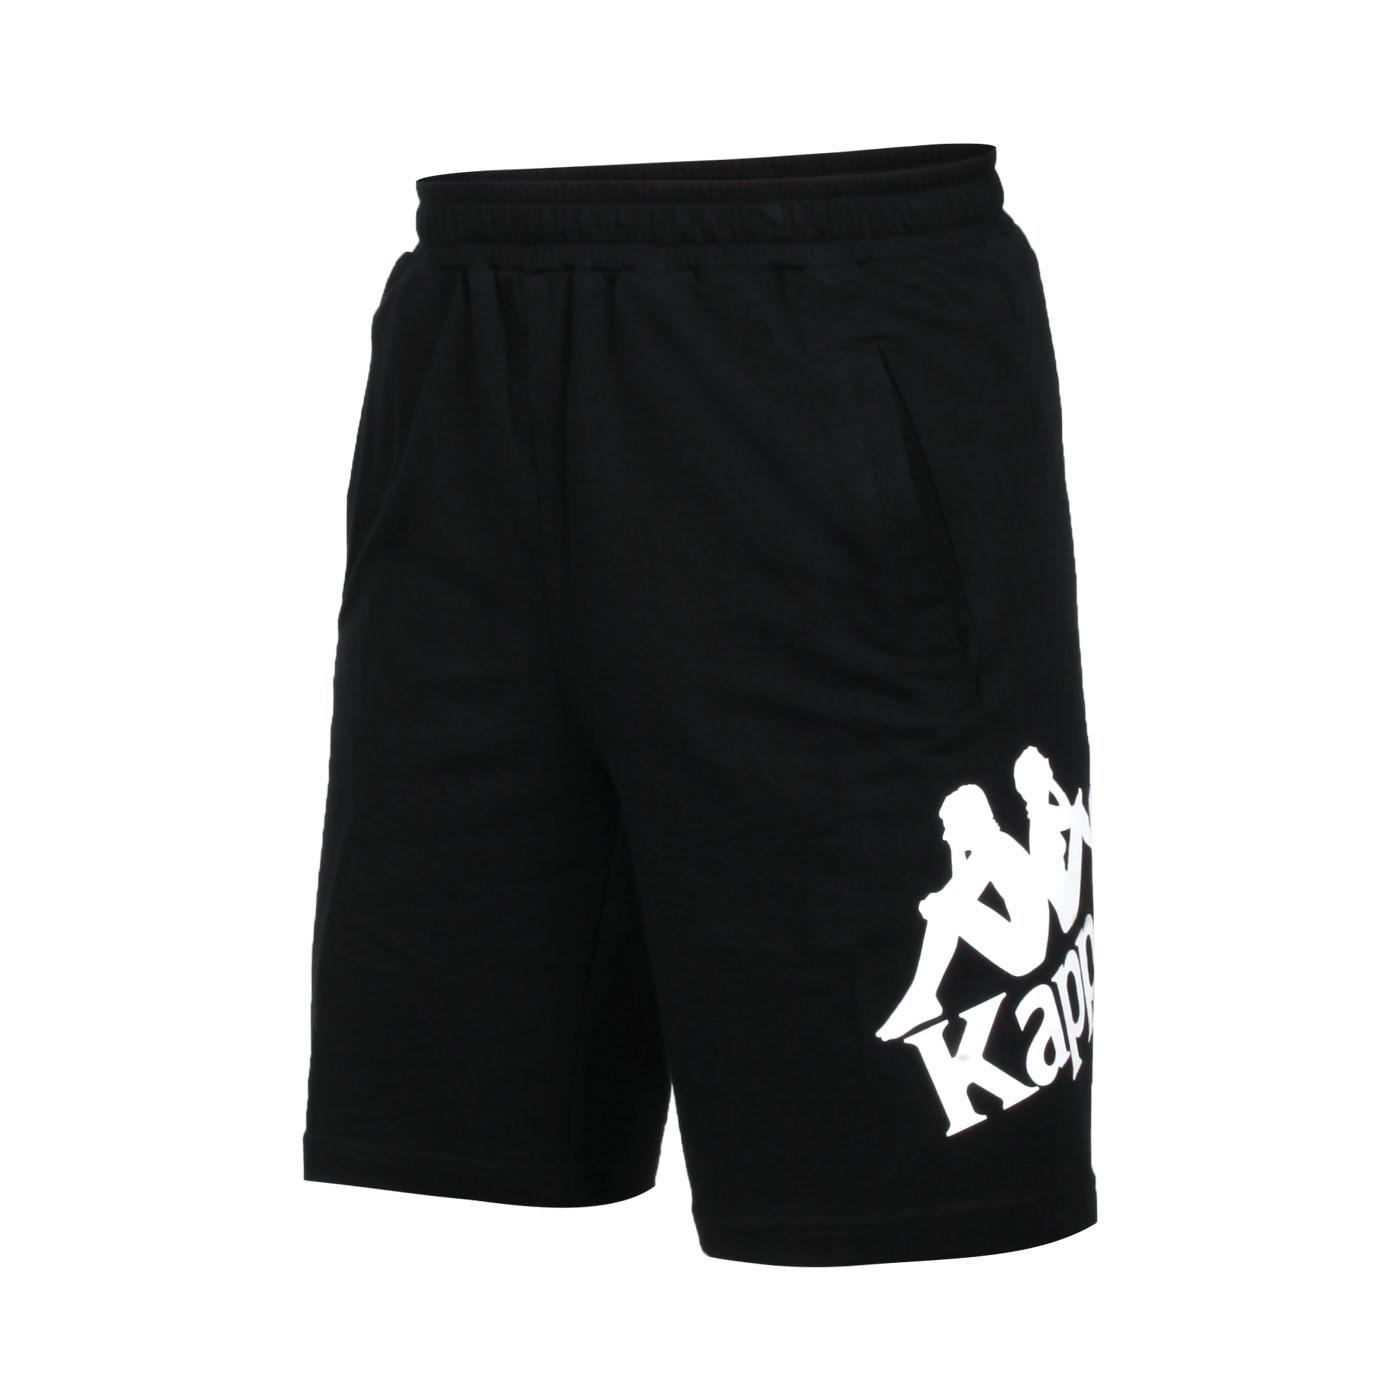 KAPPA 男款針織短褲 381772W-005 - 黑白